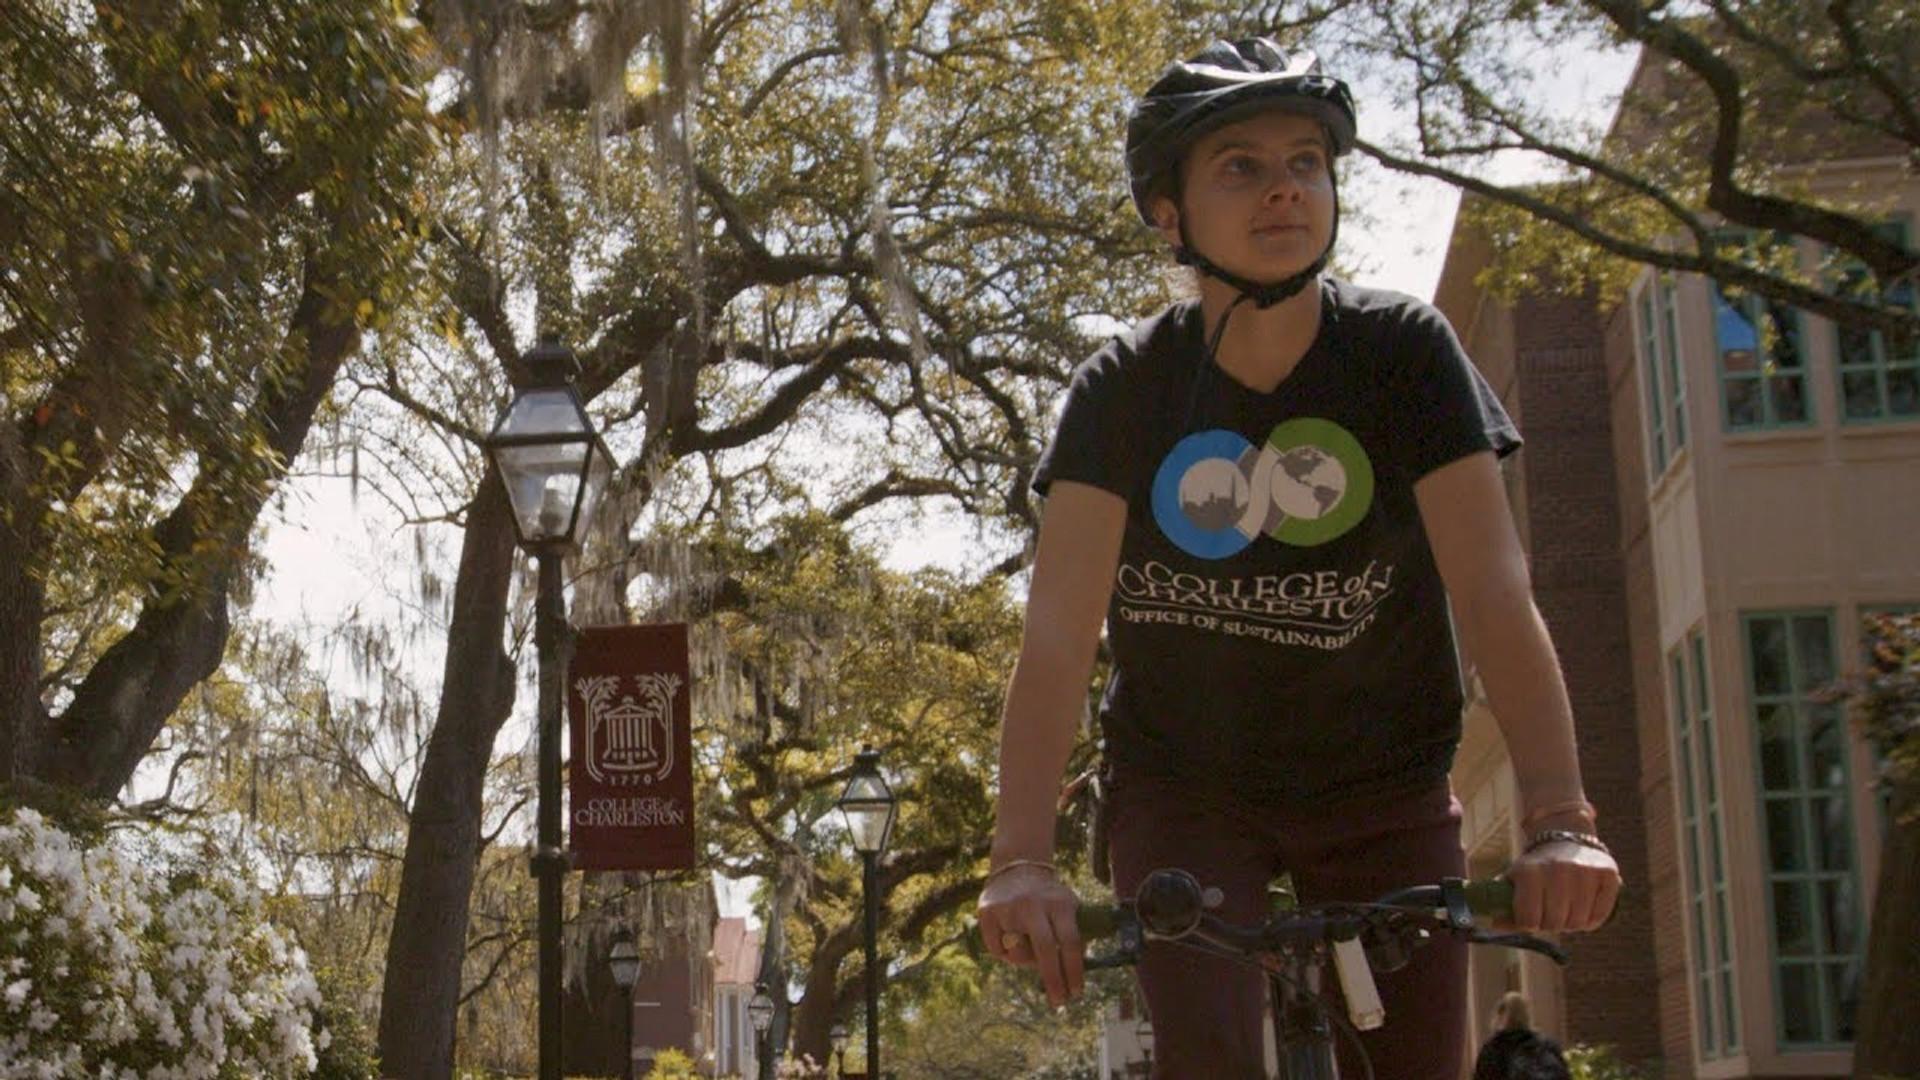 College of Charleston - Bike Share